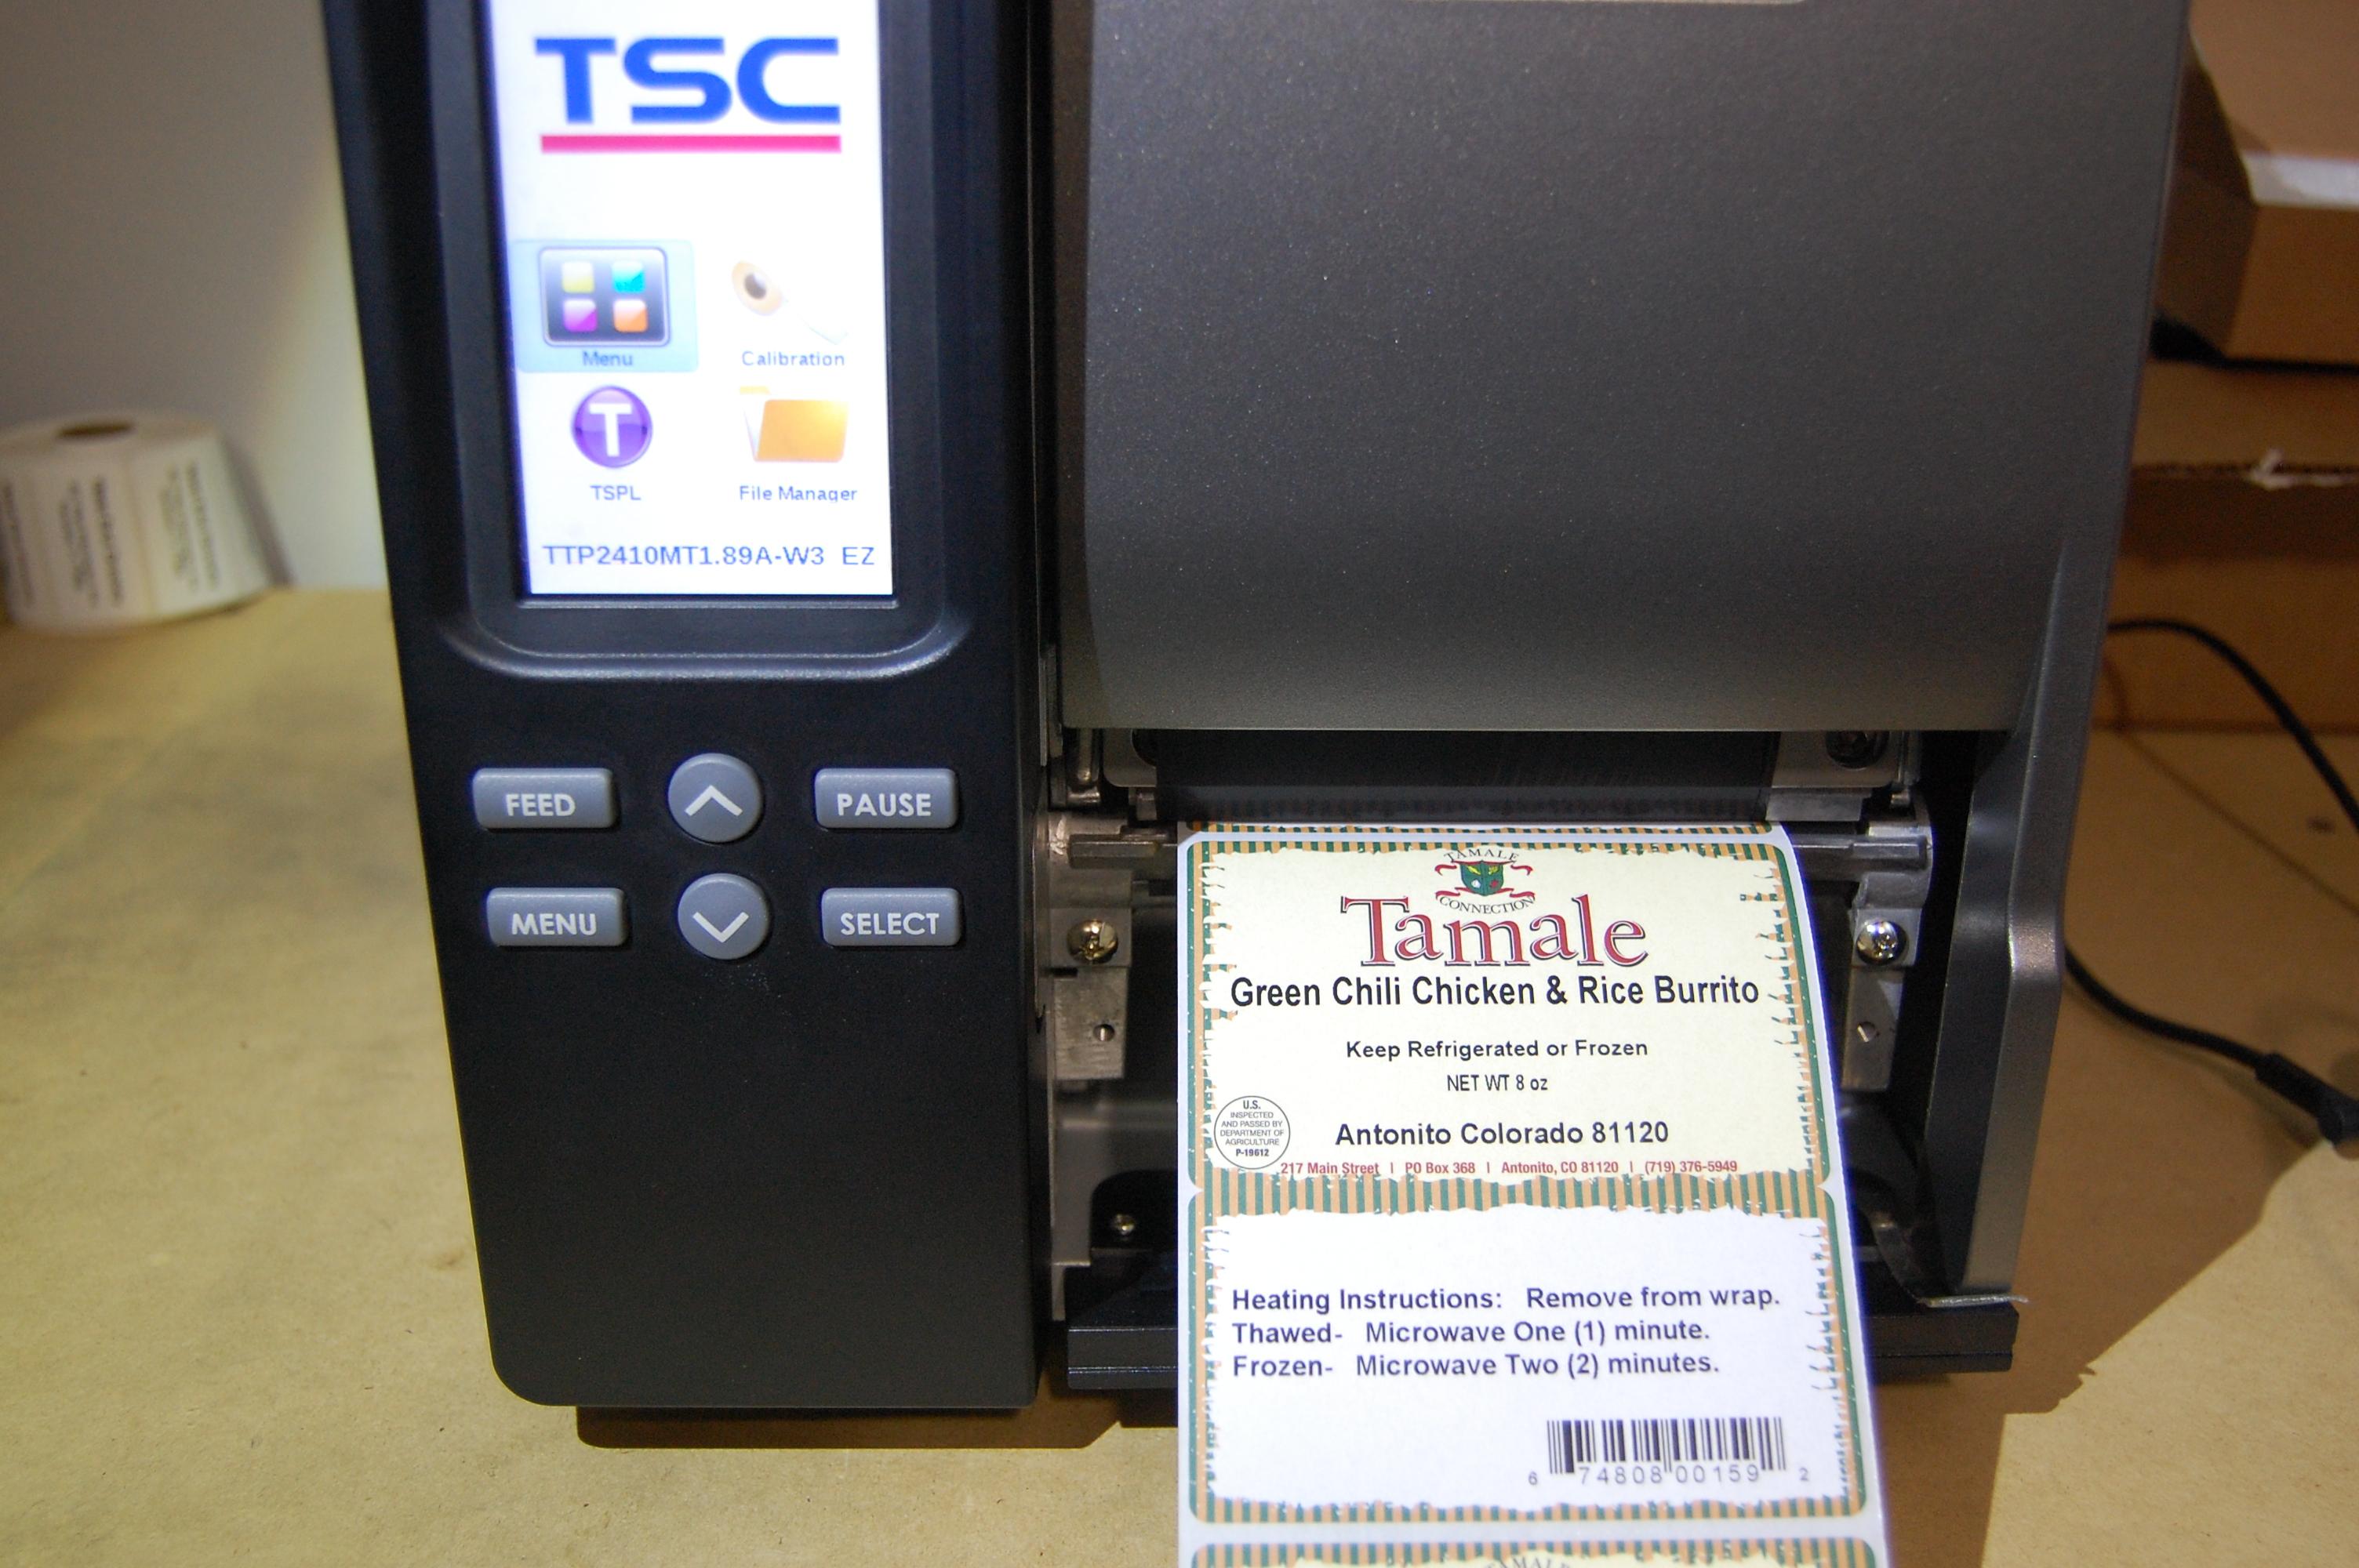 TSC Menu Settings